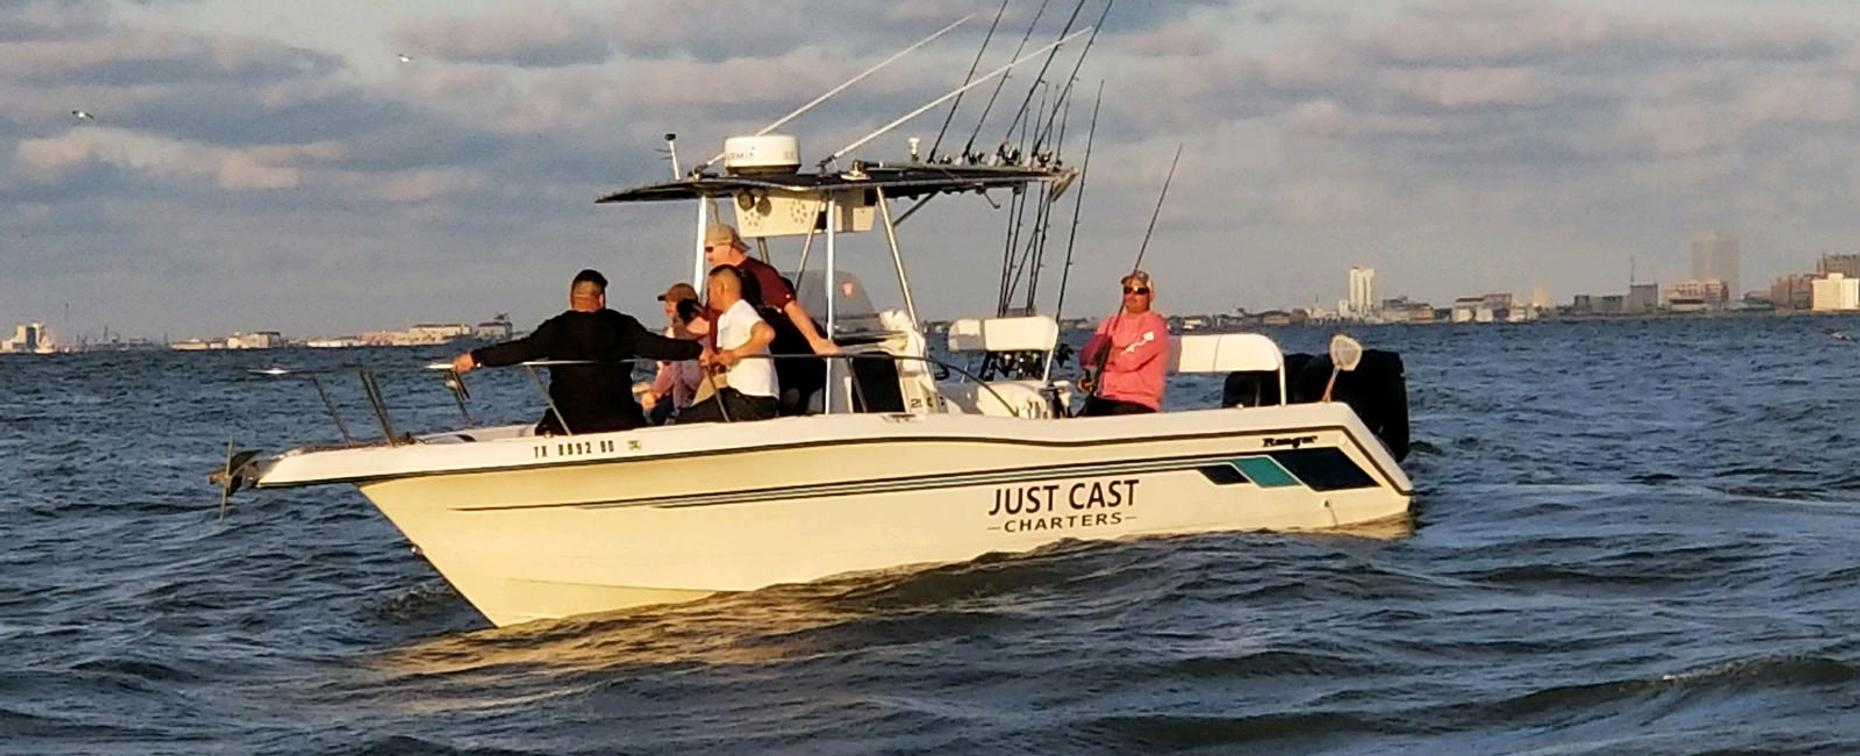 Full-Day Fishing Trip near Galveston Island